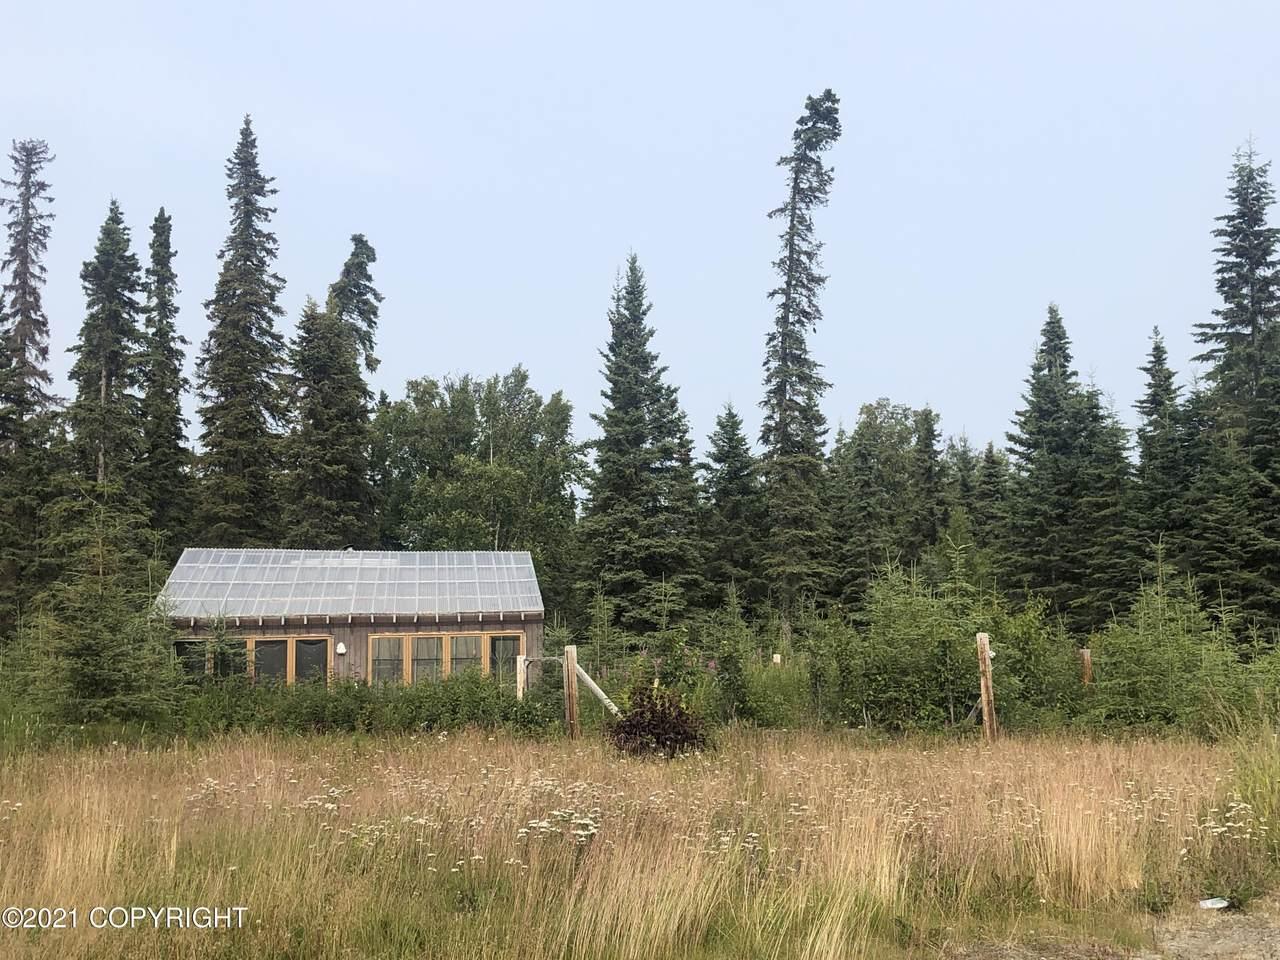 https://bt-photos.global.ssl.fastly.net/alaska/1280_boomver_1_21-13221-2.jpg